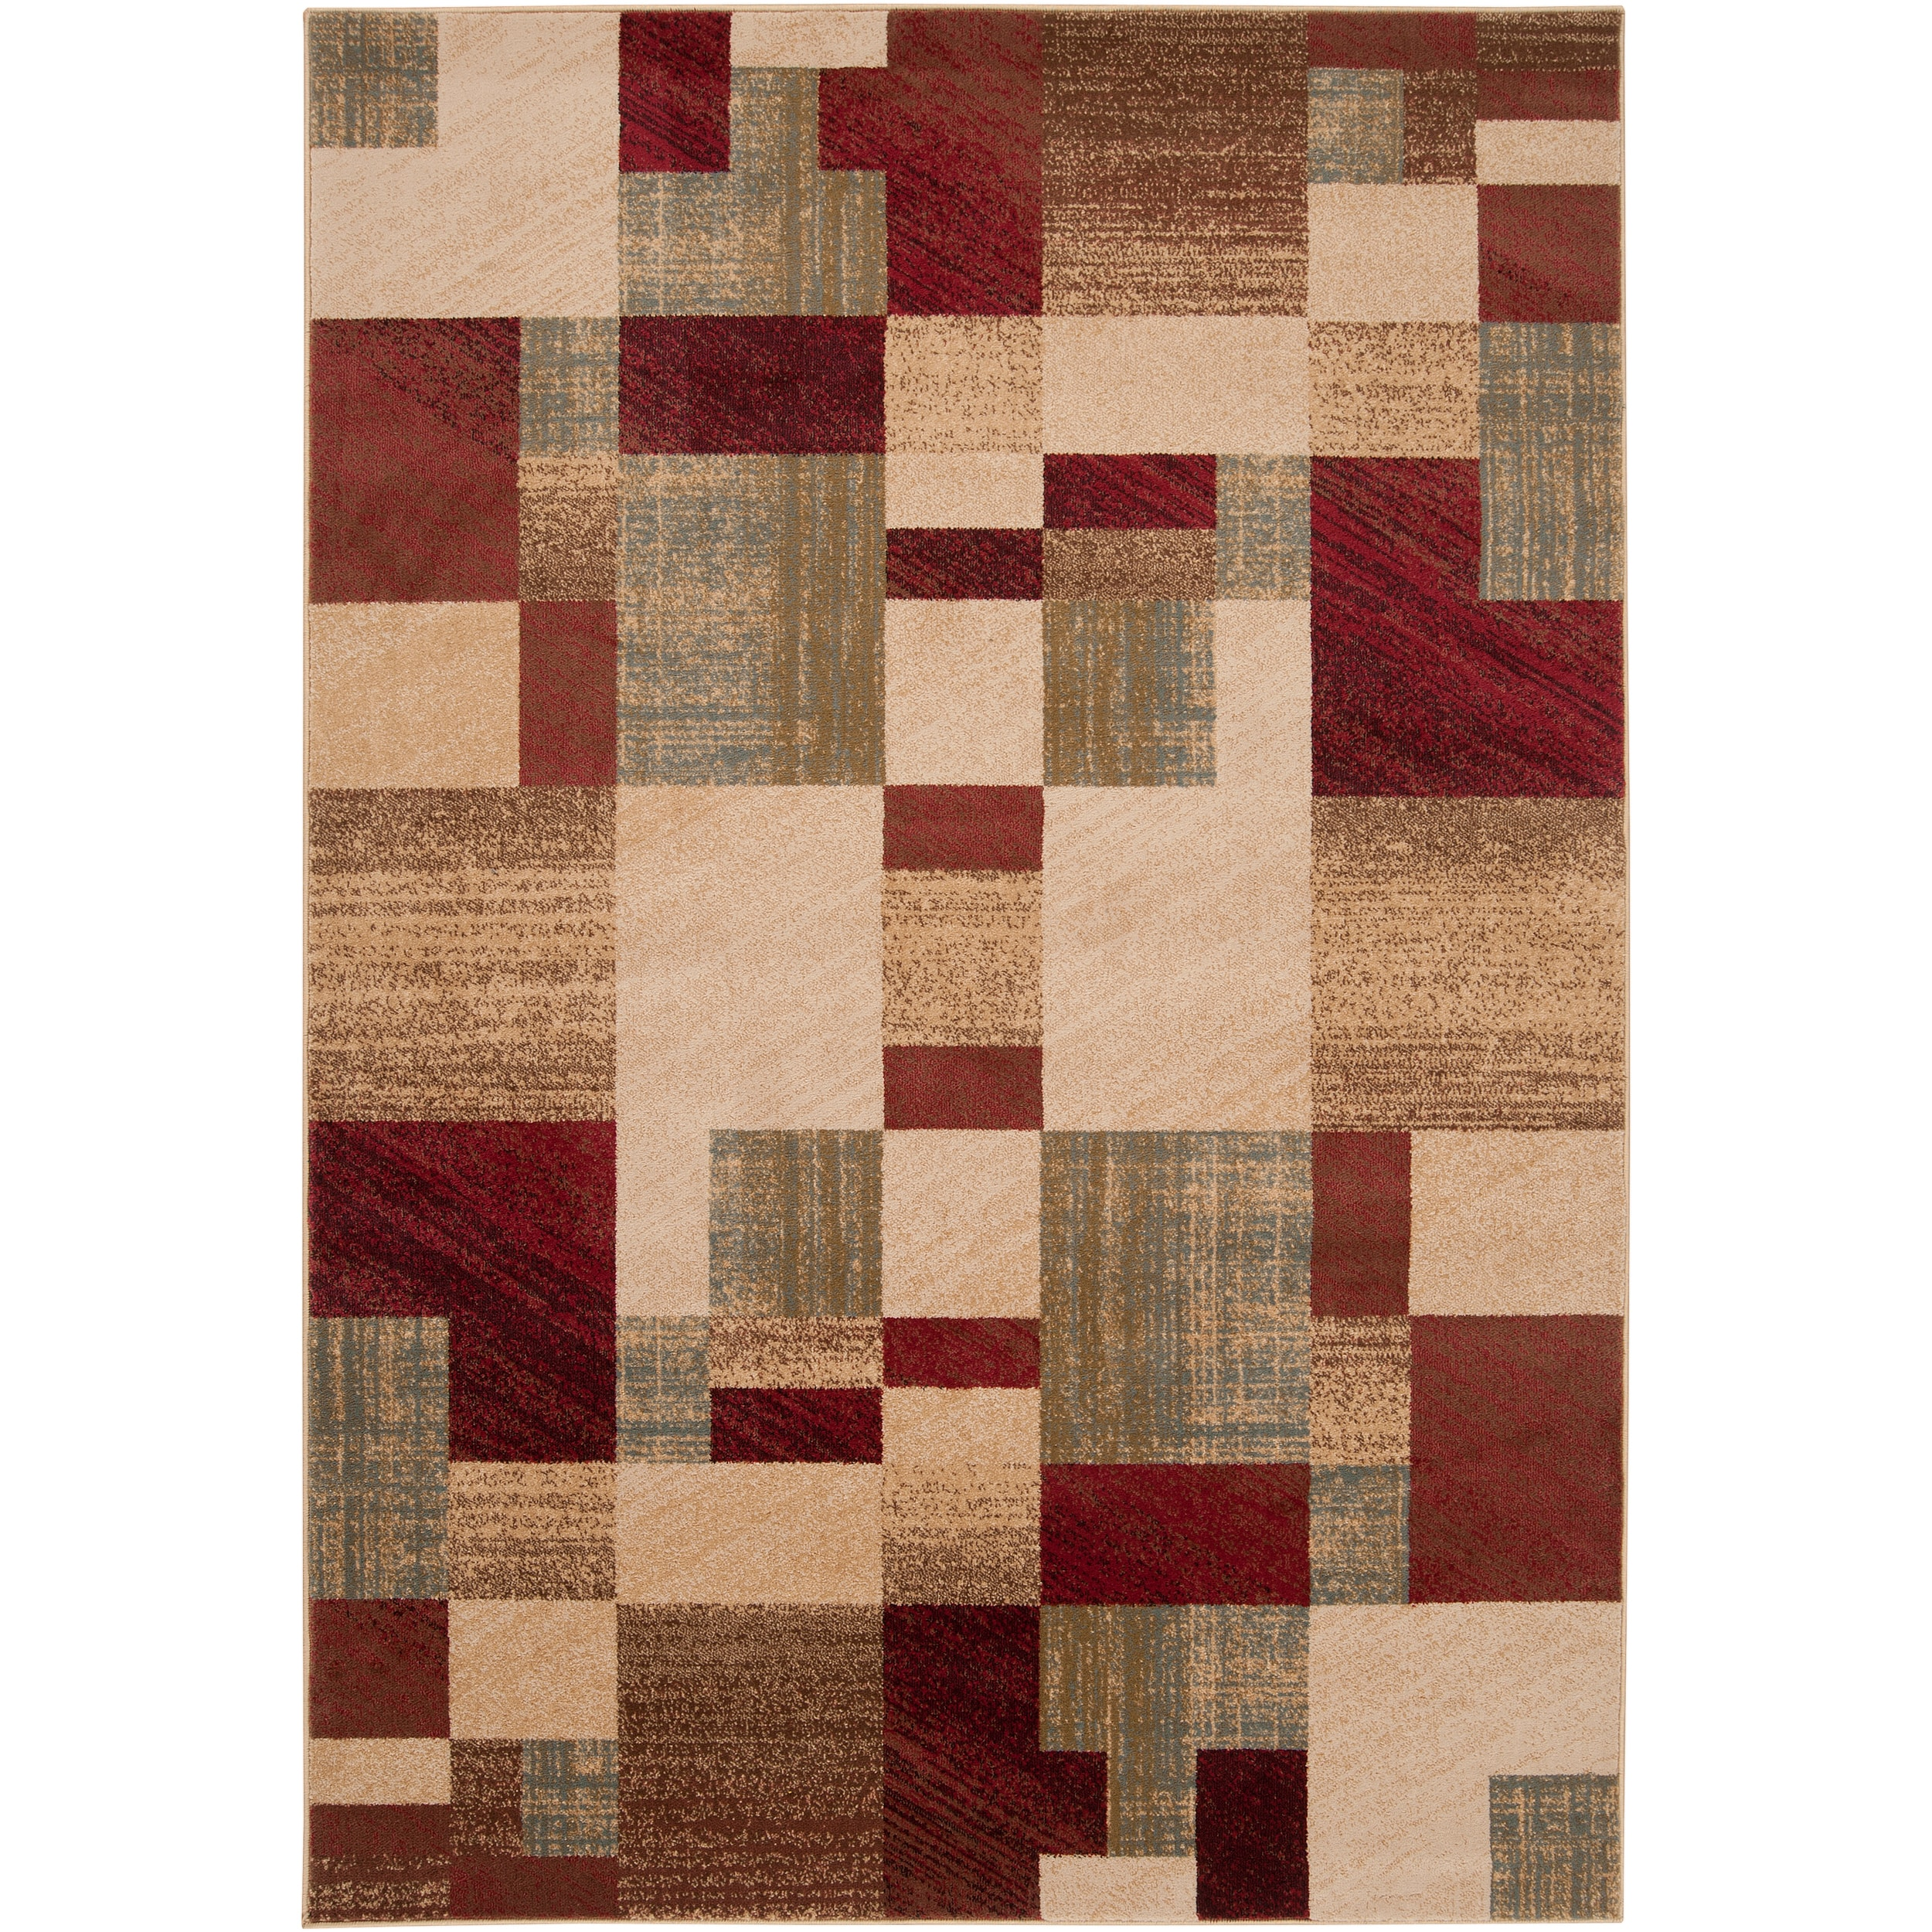 Woven Colfax Geometric Patches Plush Rug (Beige-(4' x 5'5...